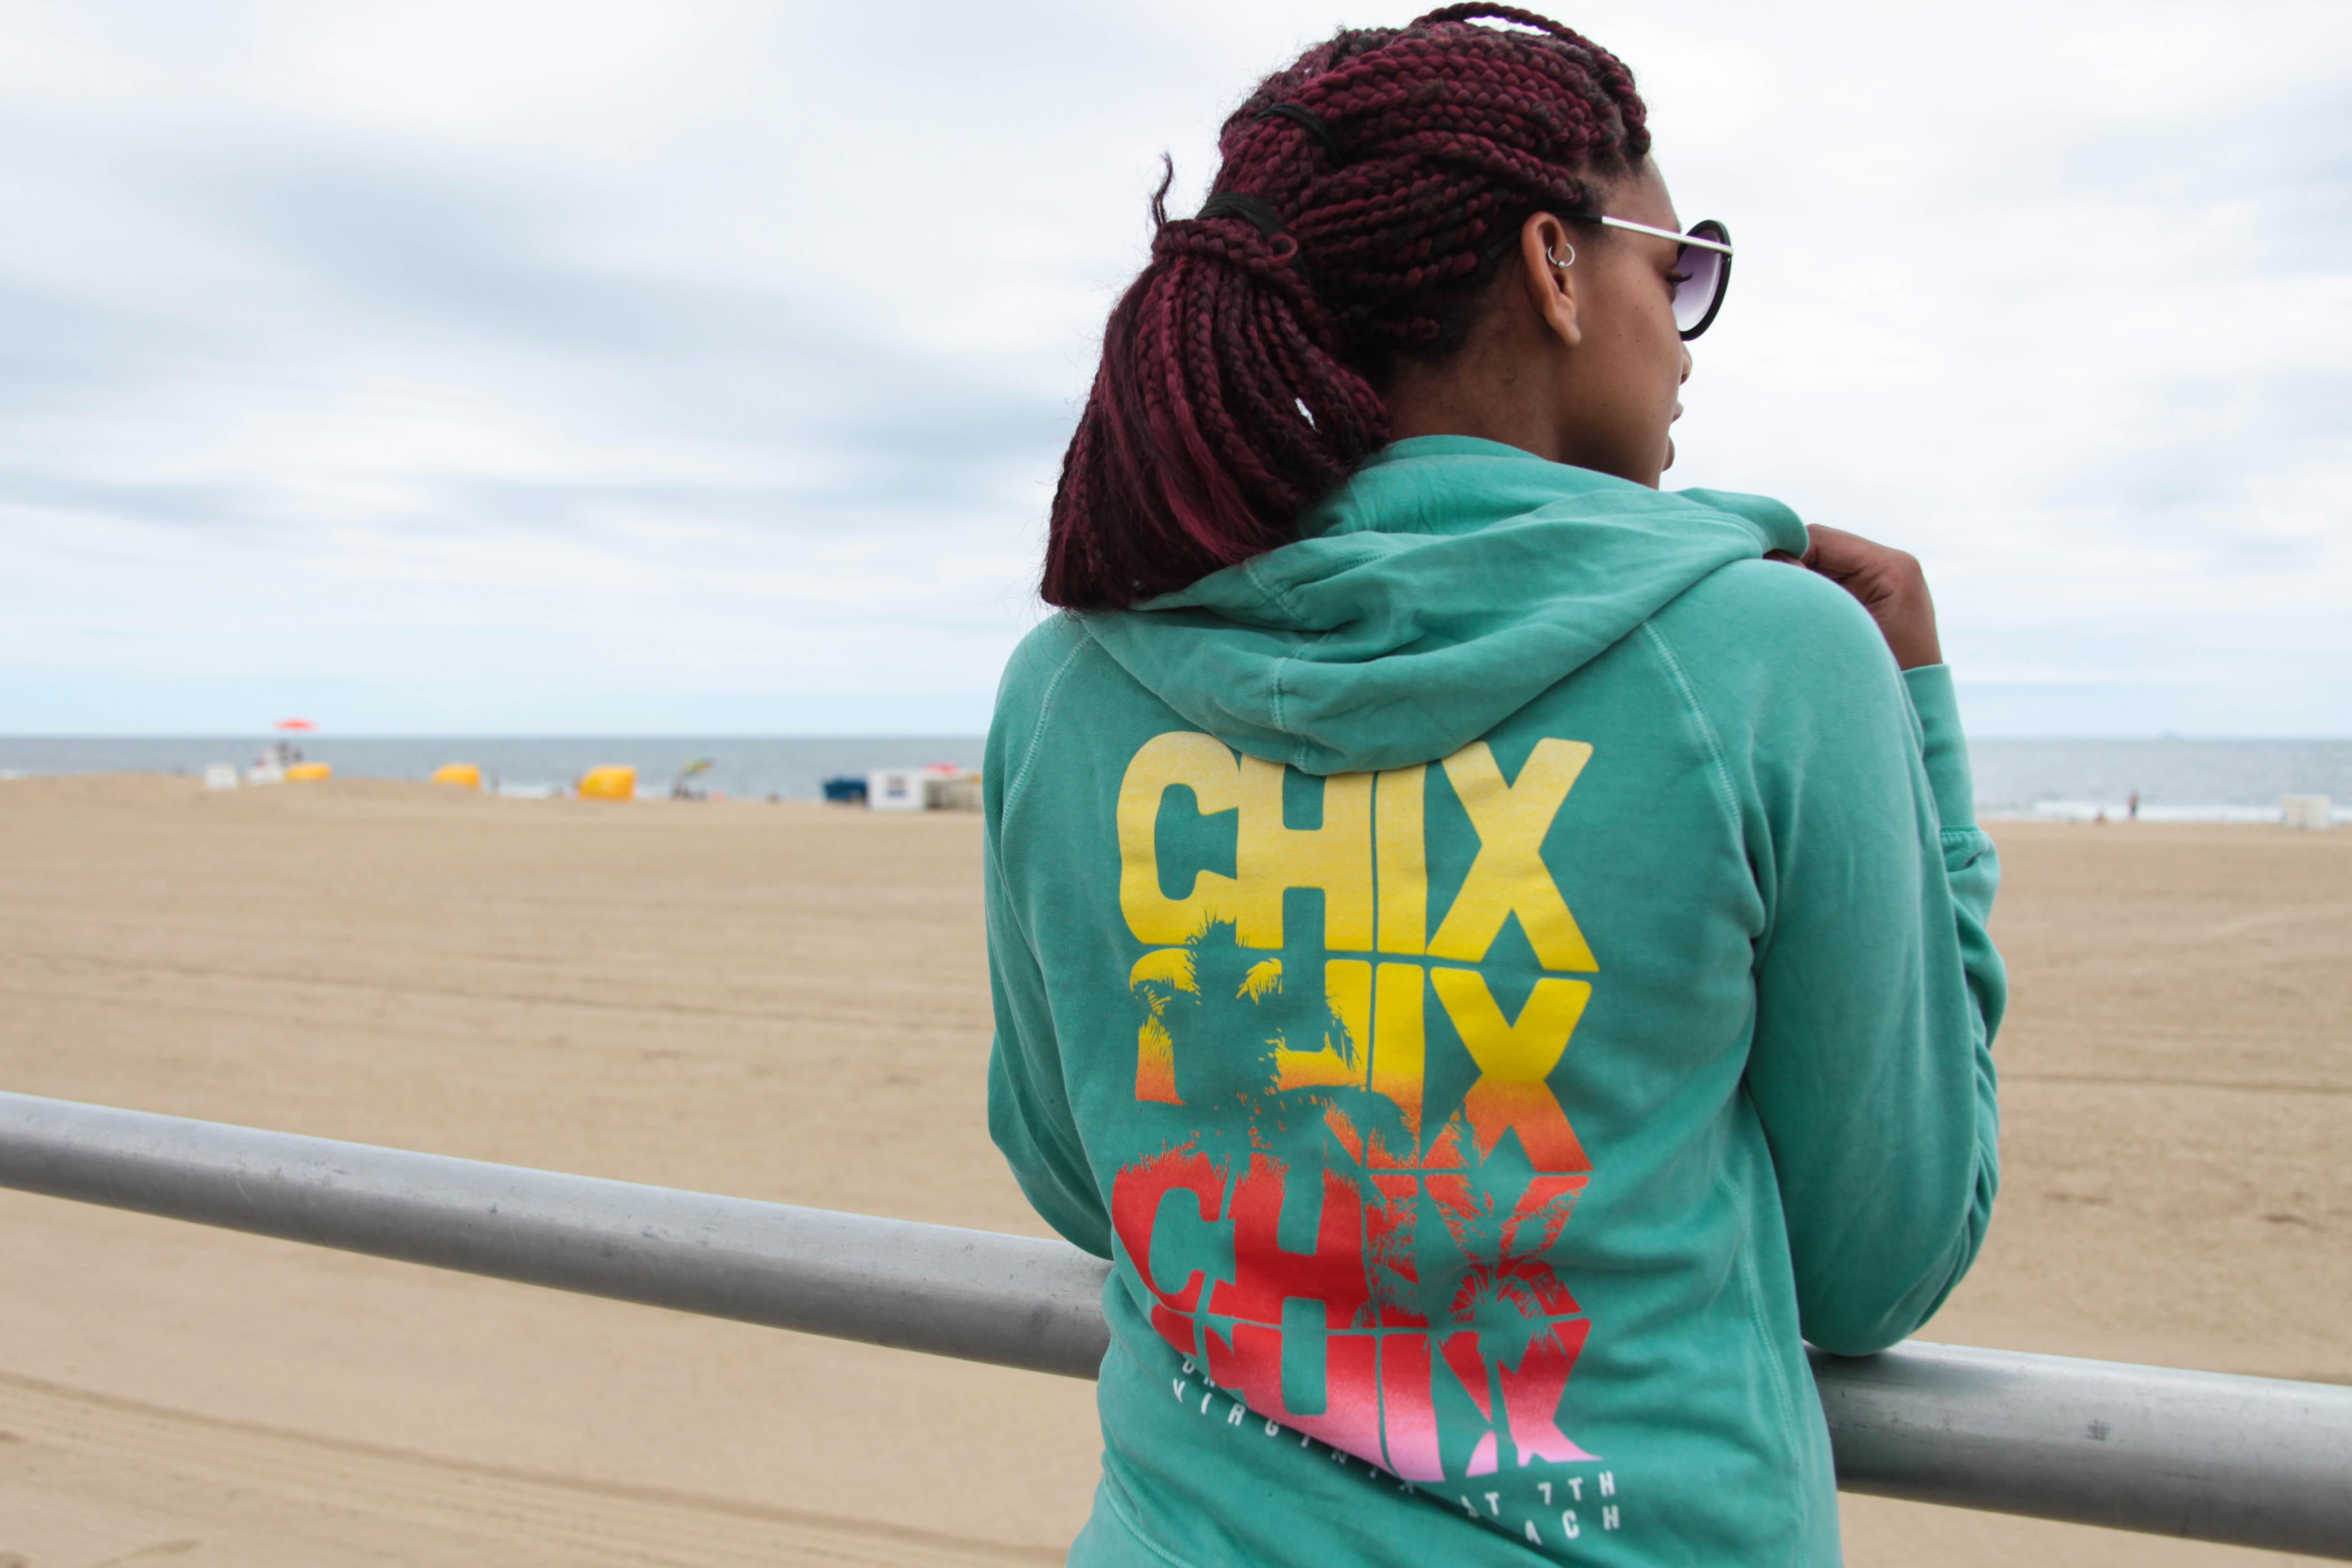 Girl Wearing Chix Hoodie